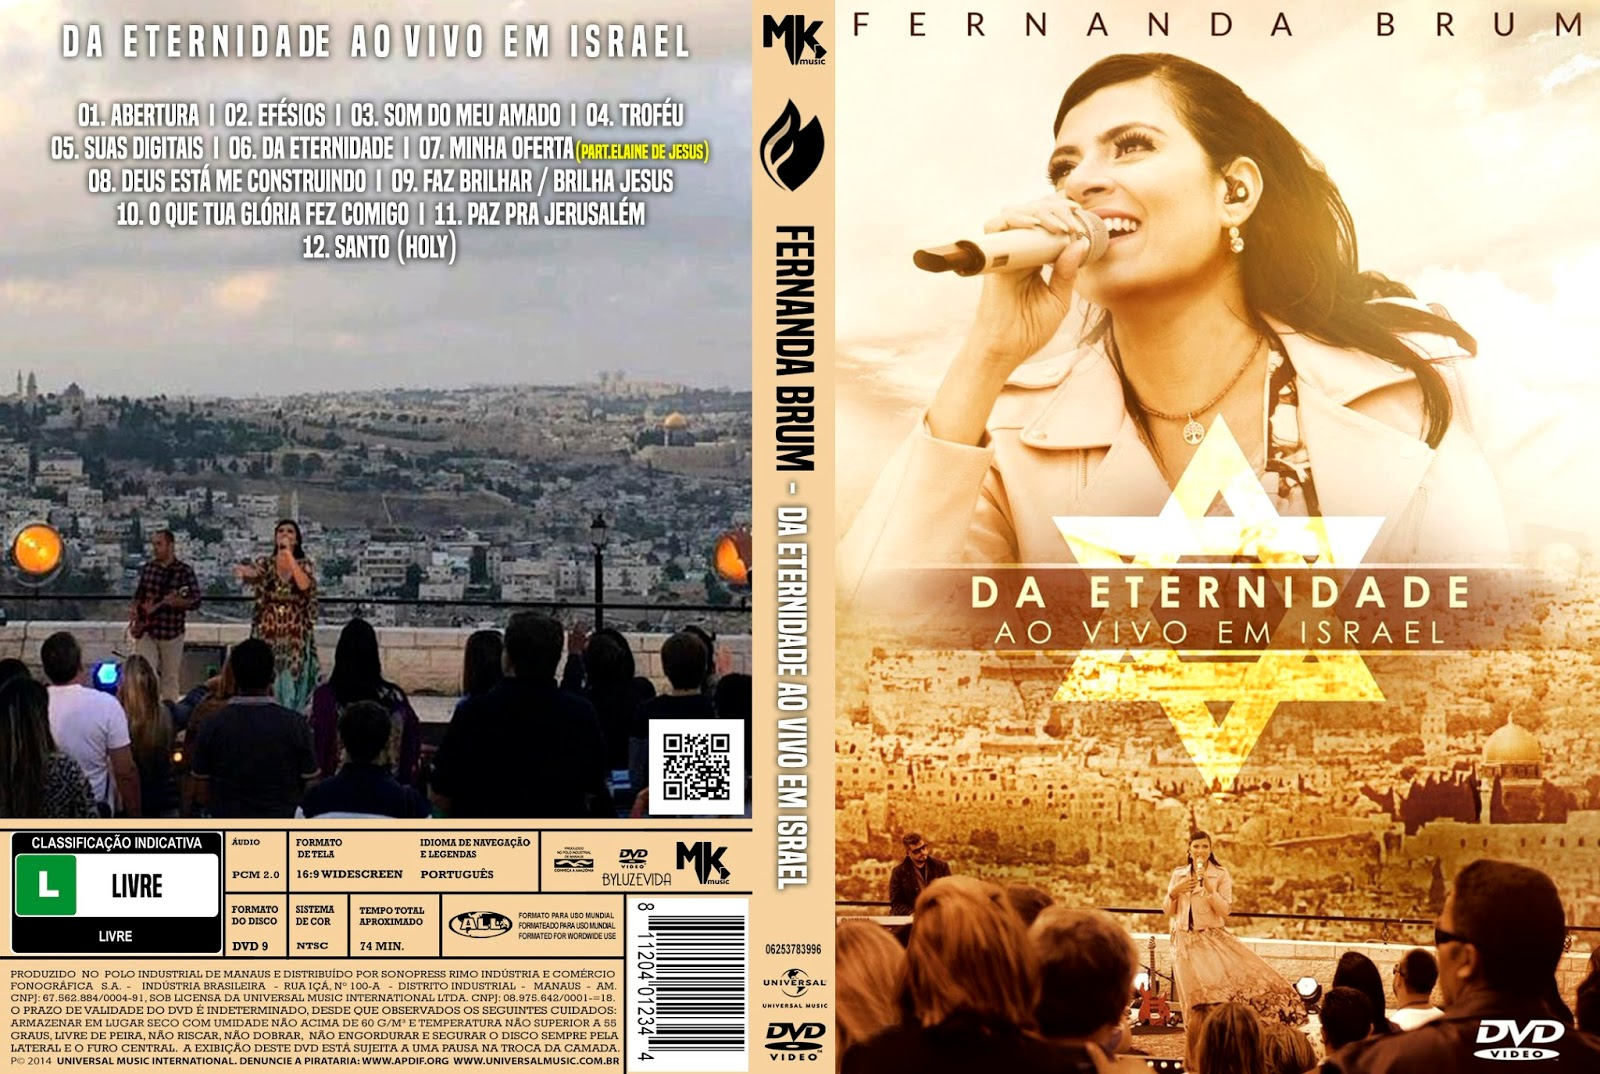 Download Fernanda Brum Da Eternidade Ao Vivo em Israel DVDRip 2016 Fernanda 2BBrum 2B 25E2 2580 2593 2BDa 2BEternidade 2BAo 2BVivo 2BEm 2BIsrael 2B 25282016 2529 2BDVD R 2BOFICIAL 2B  2BXANDAODOWNLOAD